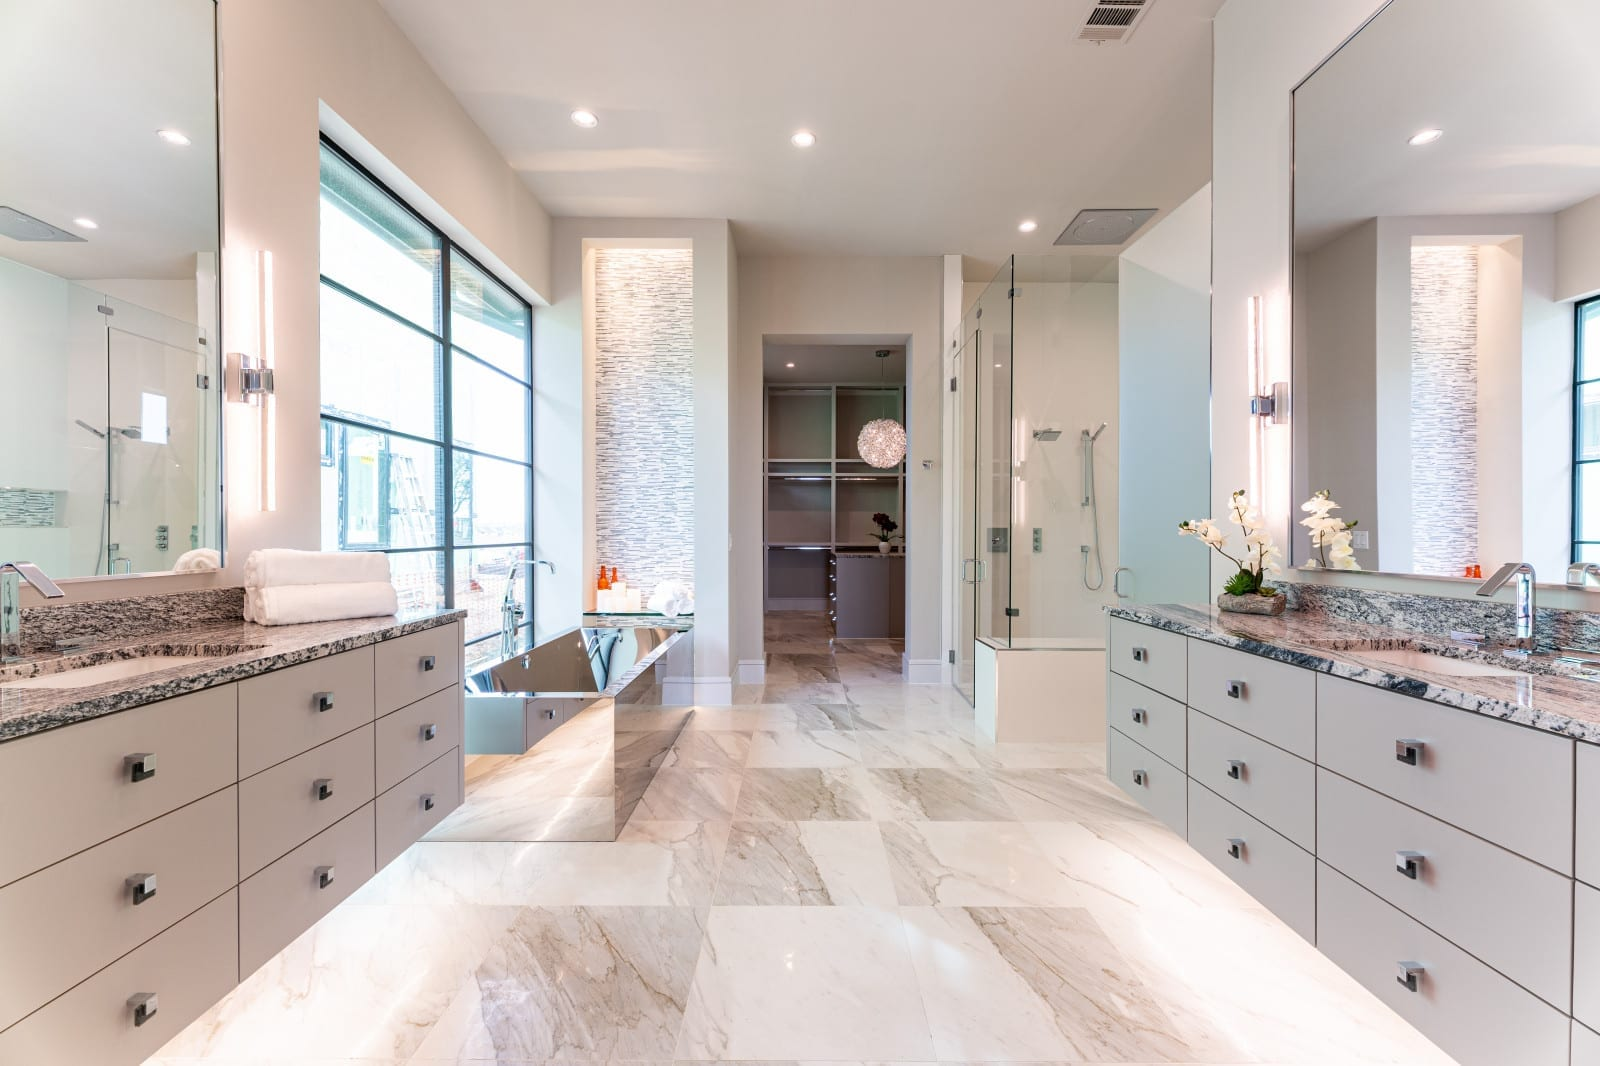 Modern Style Homes design # 21 - Millennial Design + Build